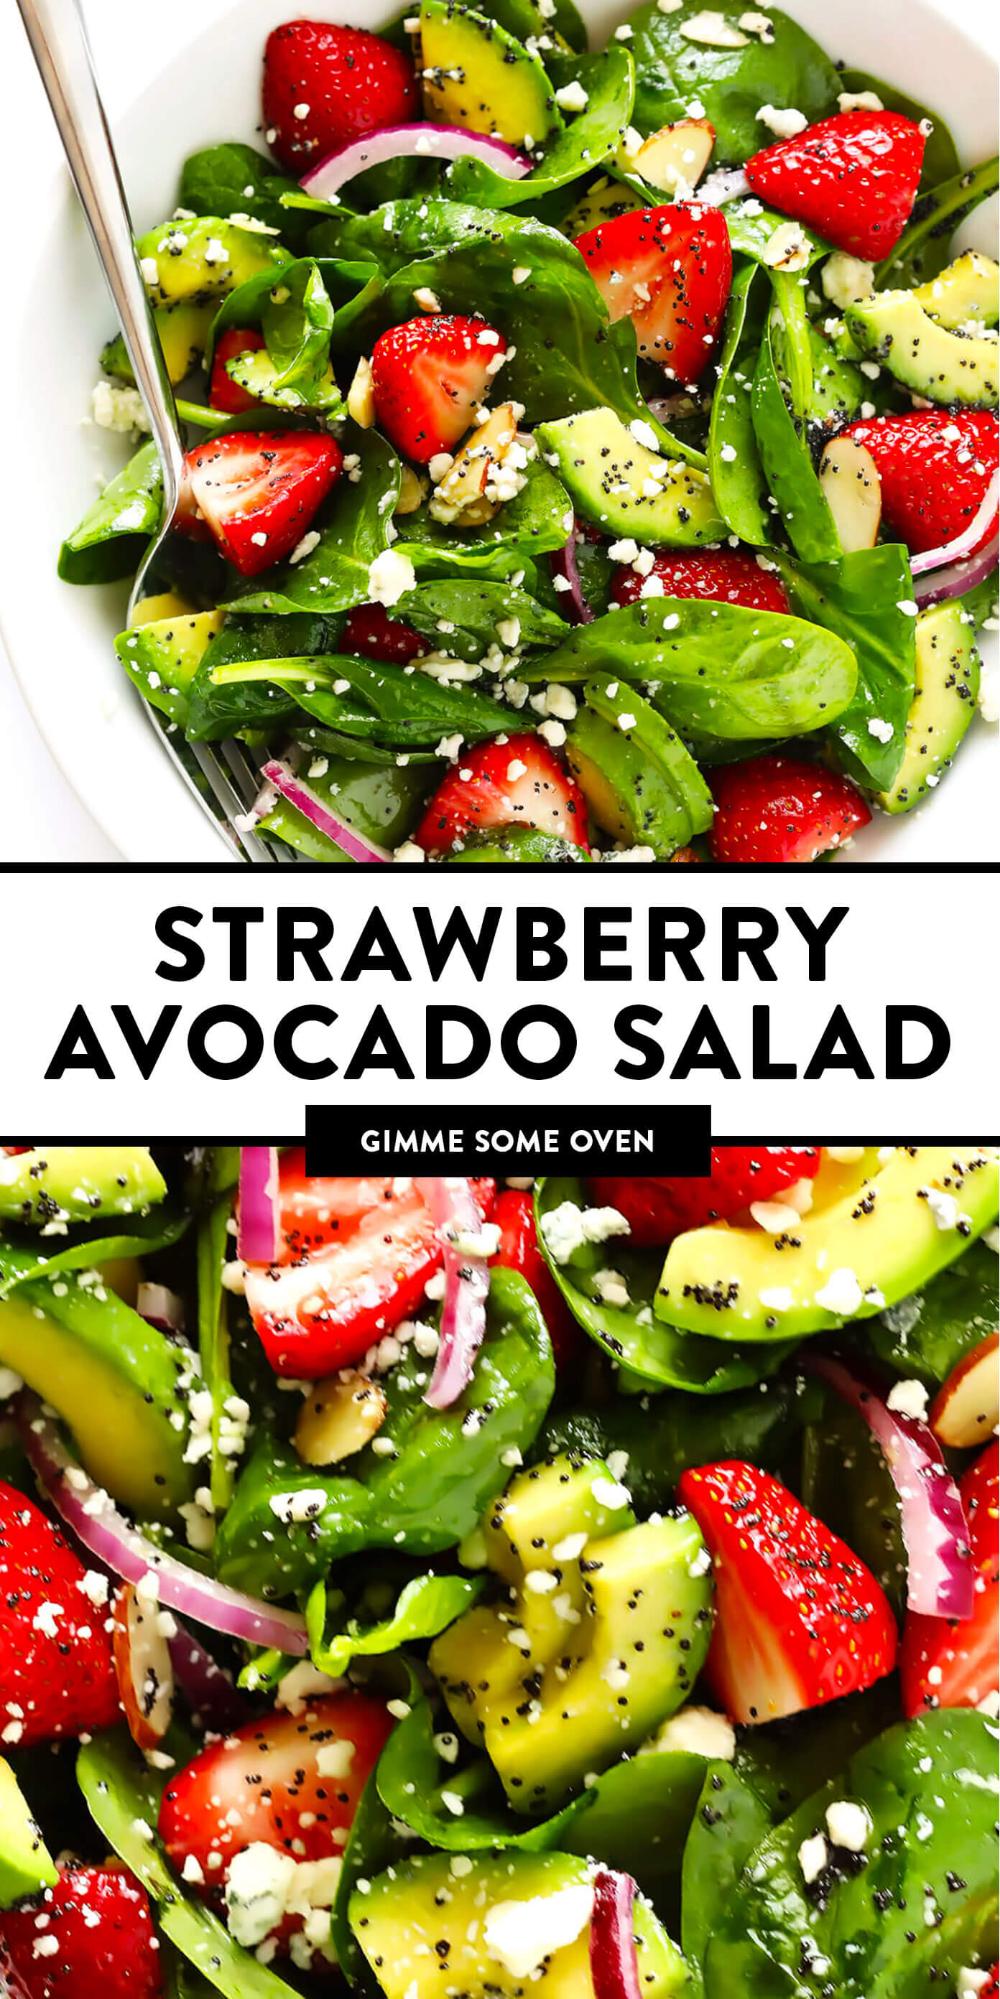 Photo of Avocado Strawberry Spinach Salad with Poppyseed Vinaigrette Recipe